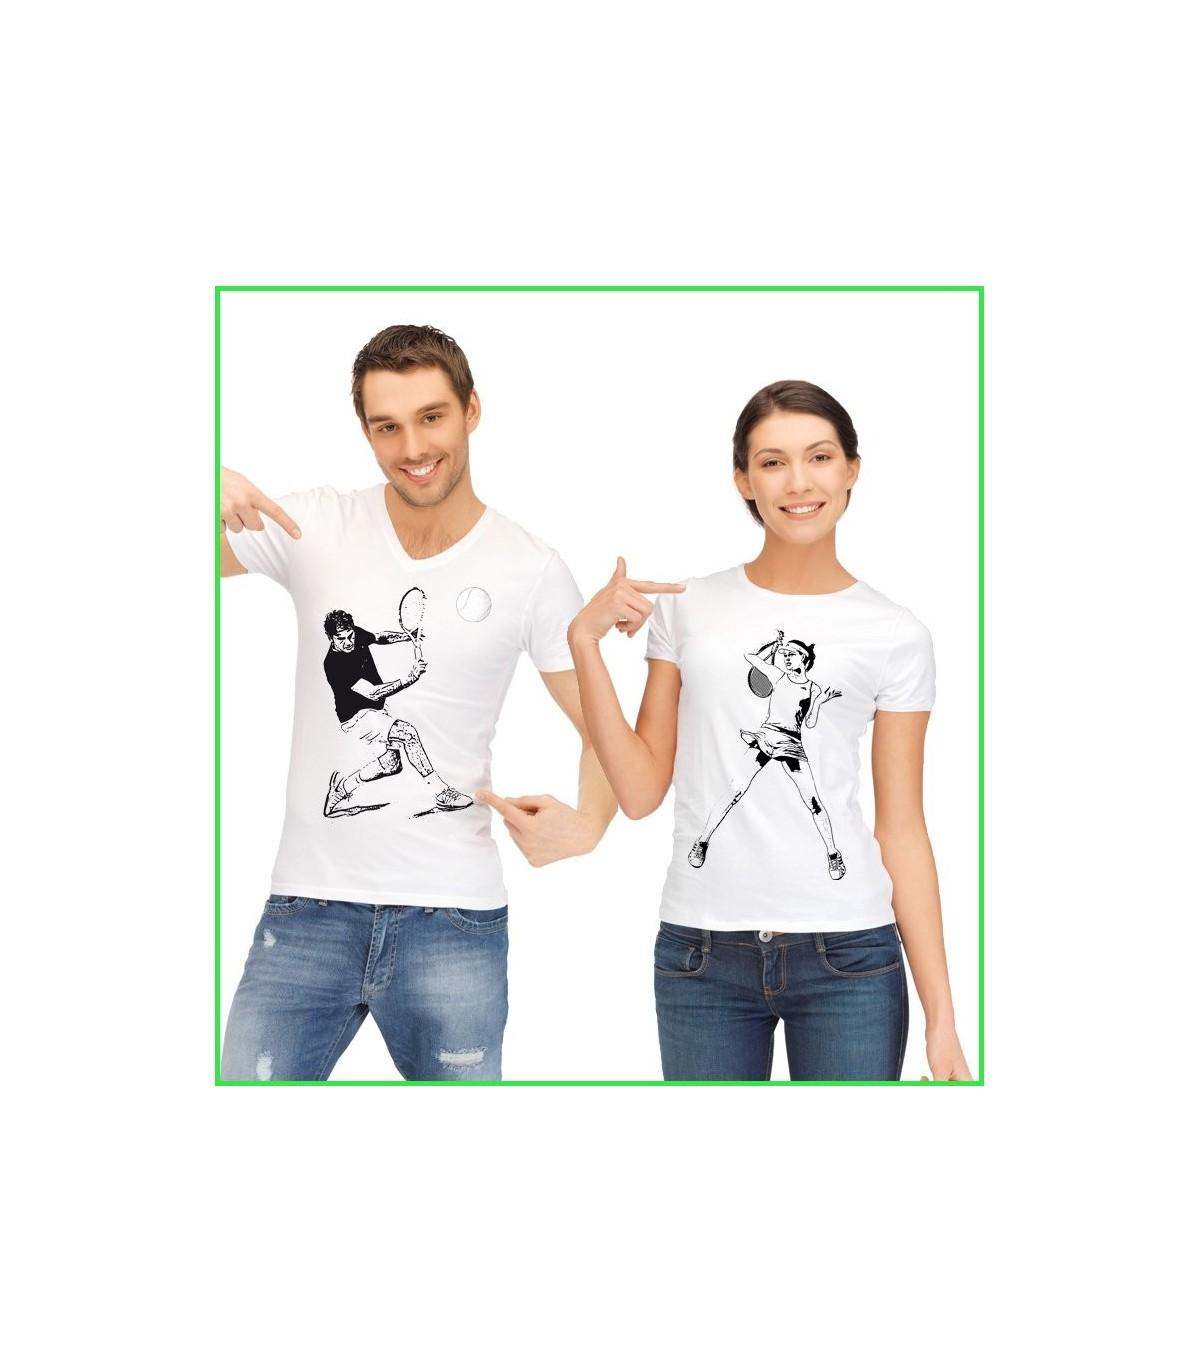 tee shirt couple tennis personnalisé